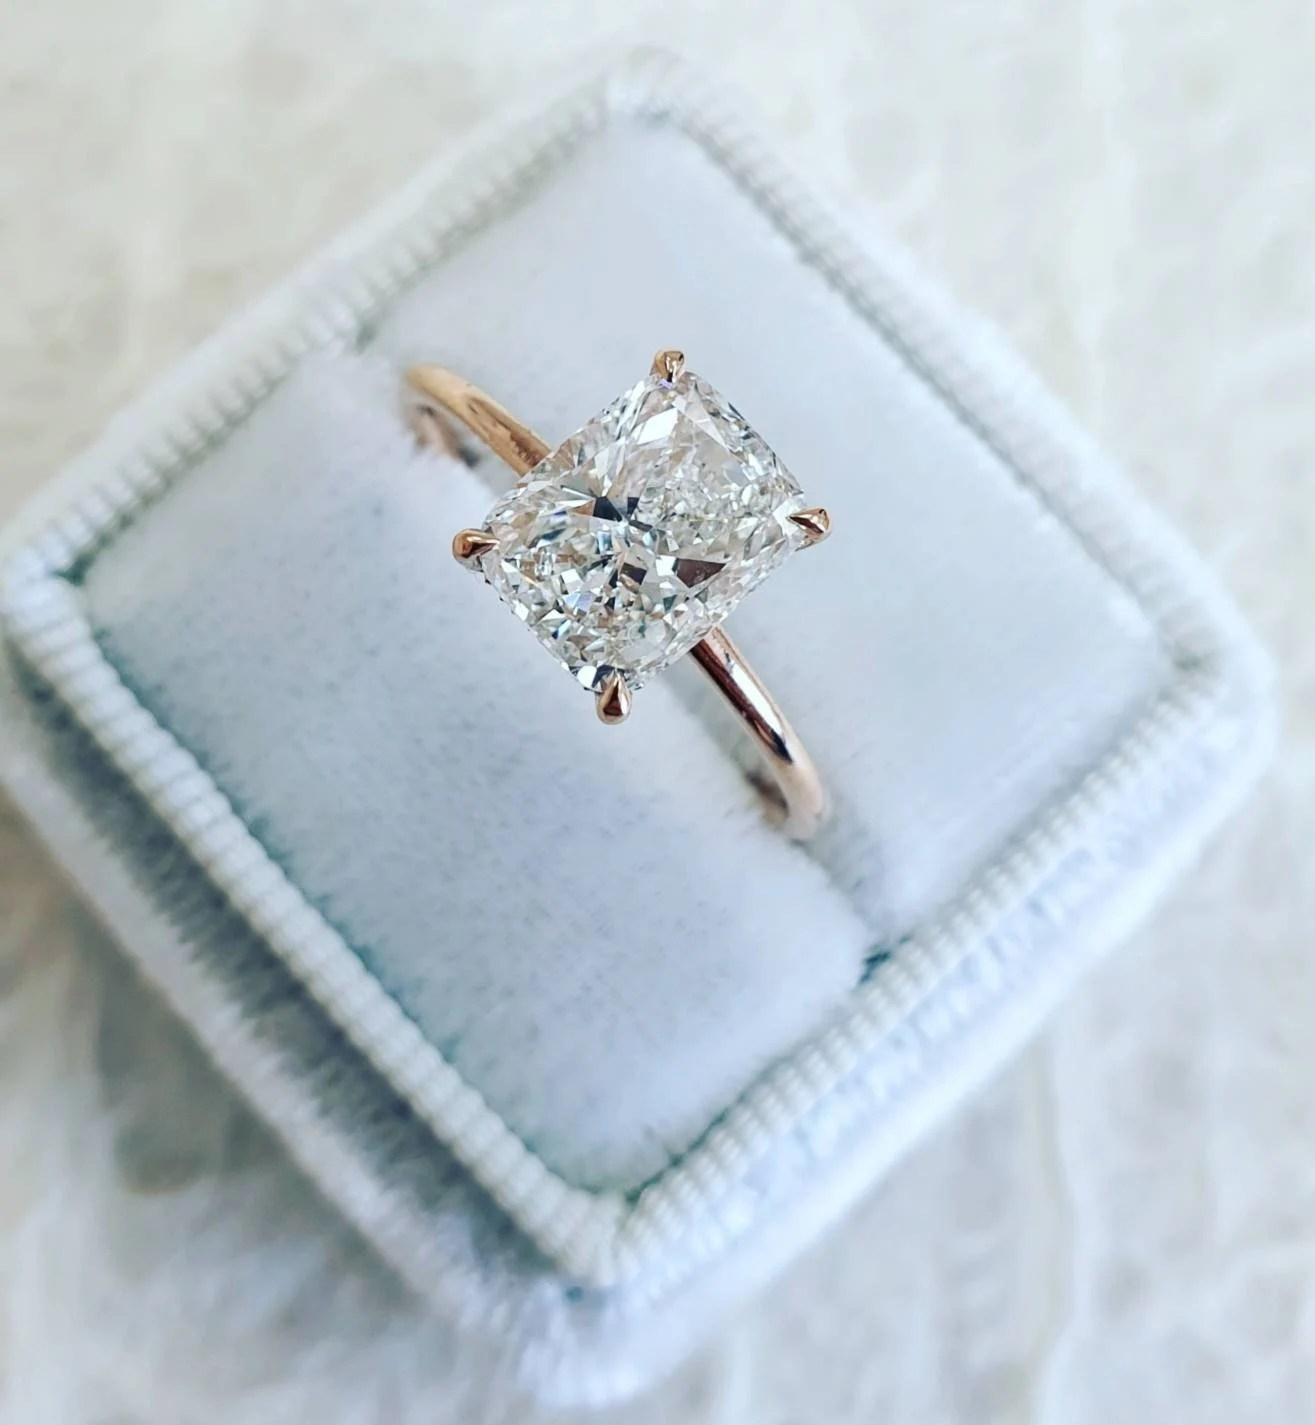 diamond engagement ring 1 70 carat elongated cushion diamond unique diamond ring cushion cut engagement ring diamond ring free shipping